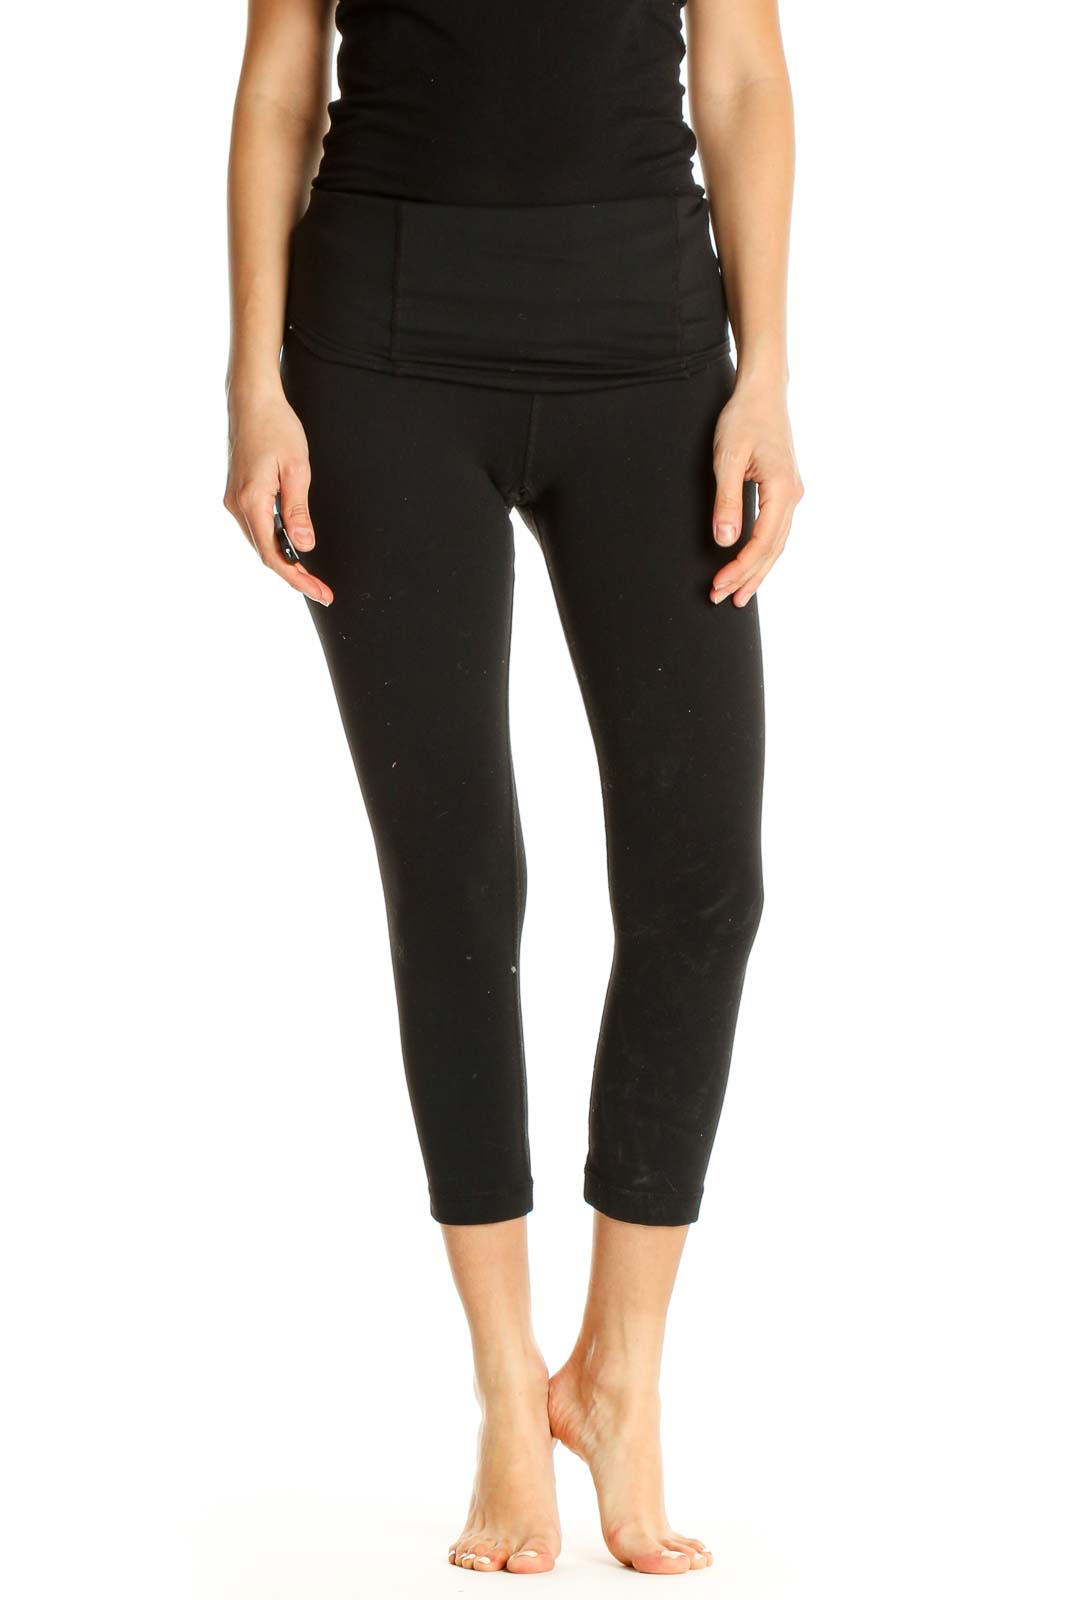 Black Solid Activewear Leggings Front